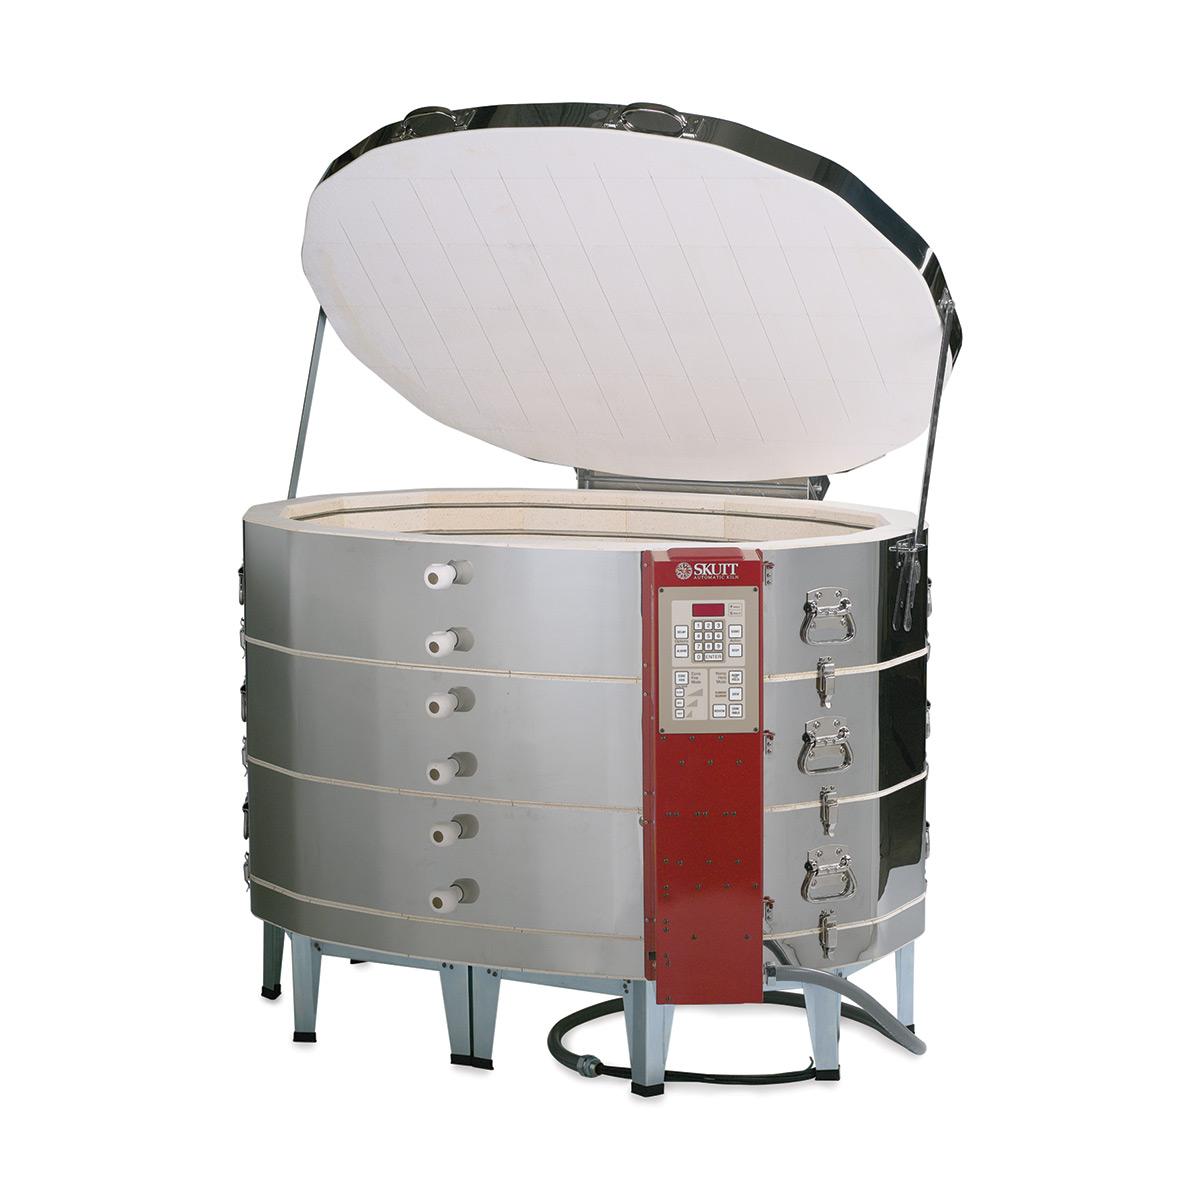 Skutt KM Series Kilnmaster Automatic Kiln - KM-1627-3PK, Cone 10, 208V, 3P, 76A